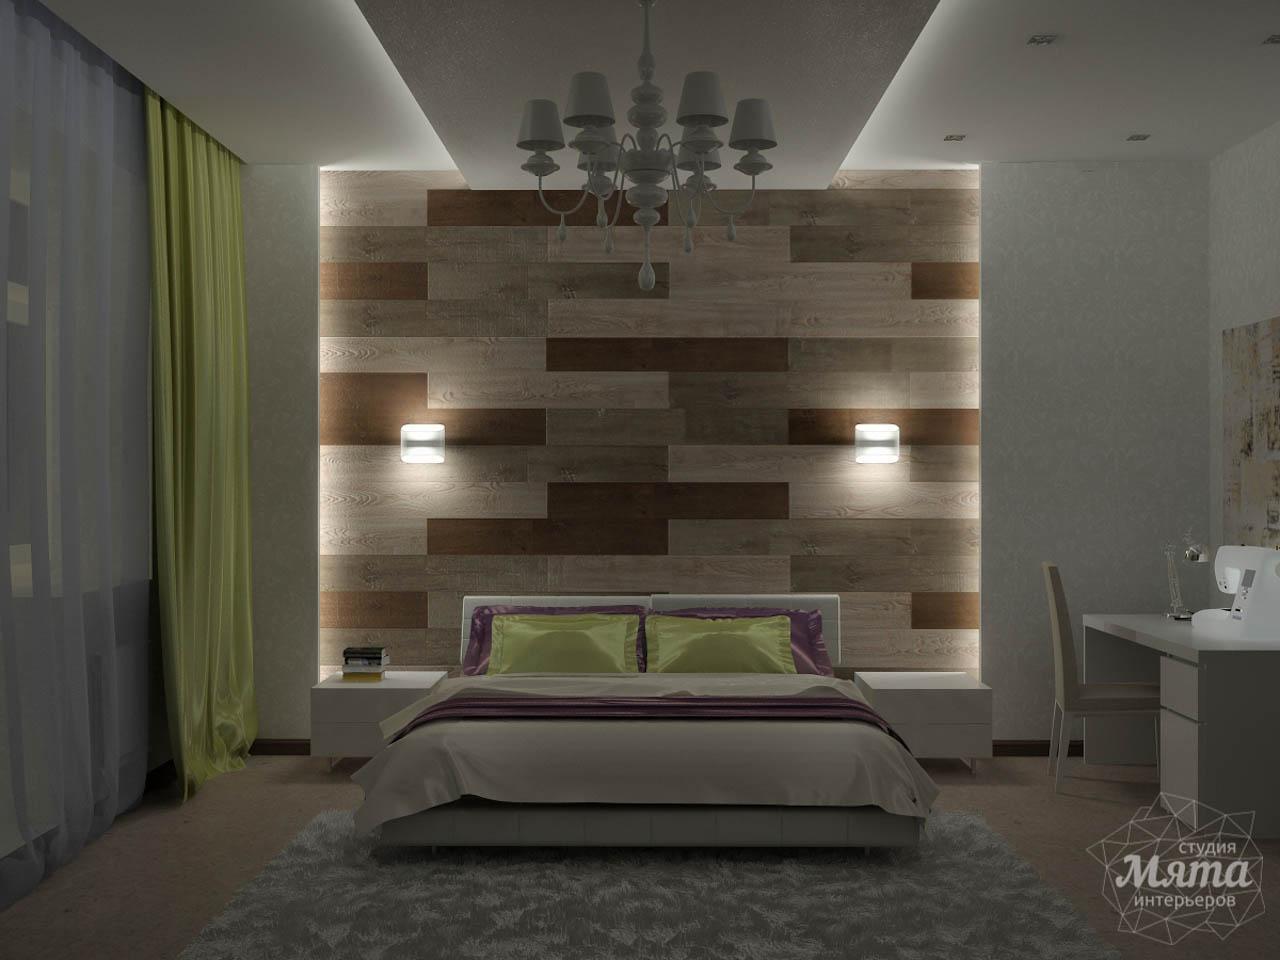 Дизайн проект интерьера коттеджа  в стиле минимализм по ул. Барвинка 15 img323227693